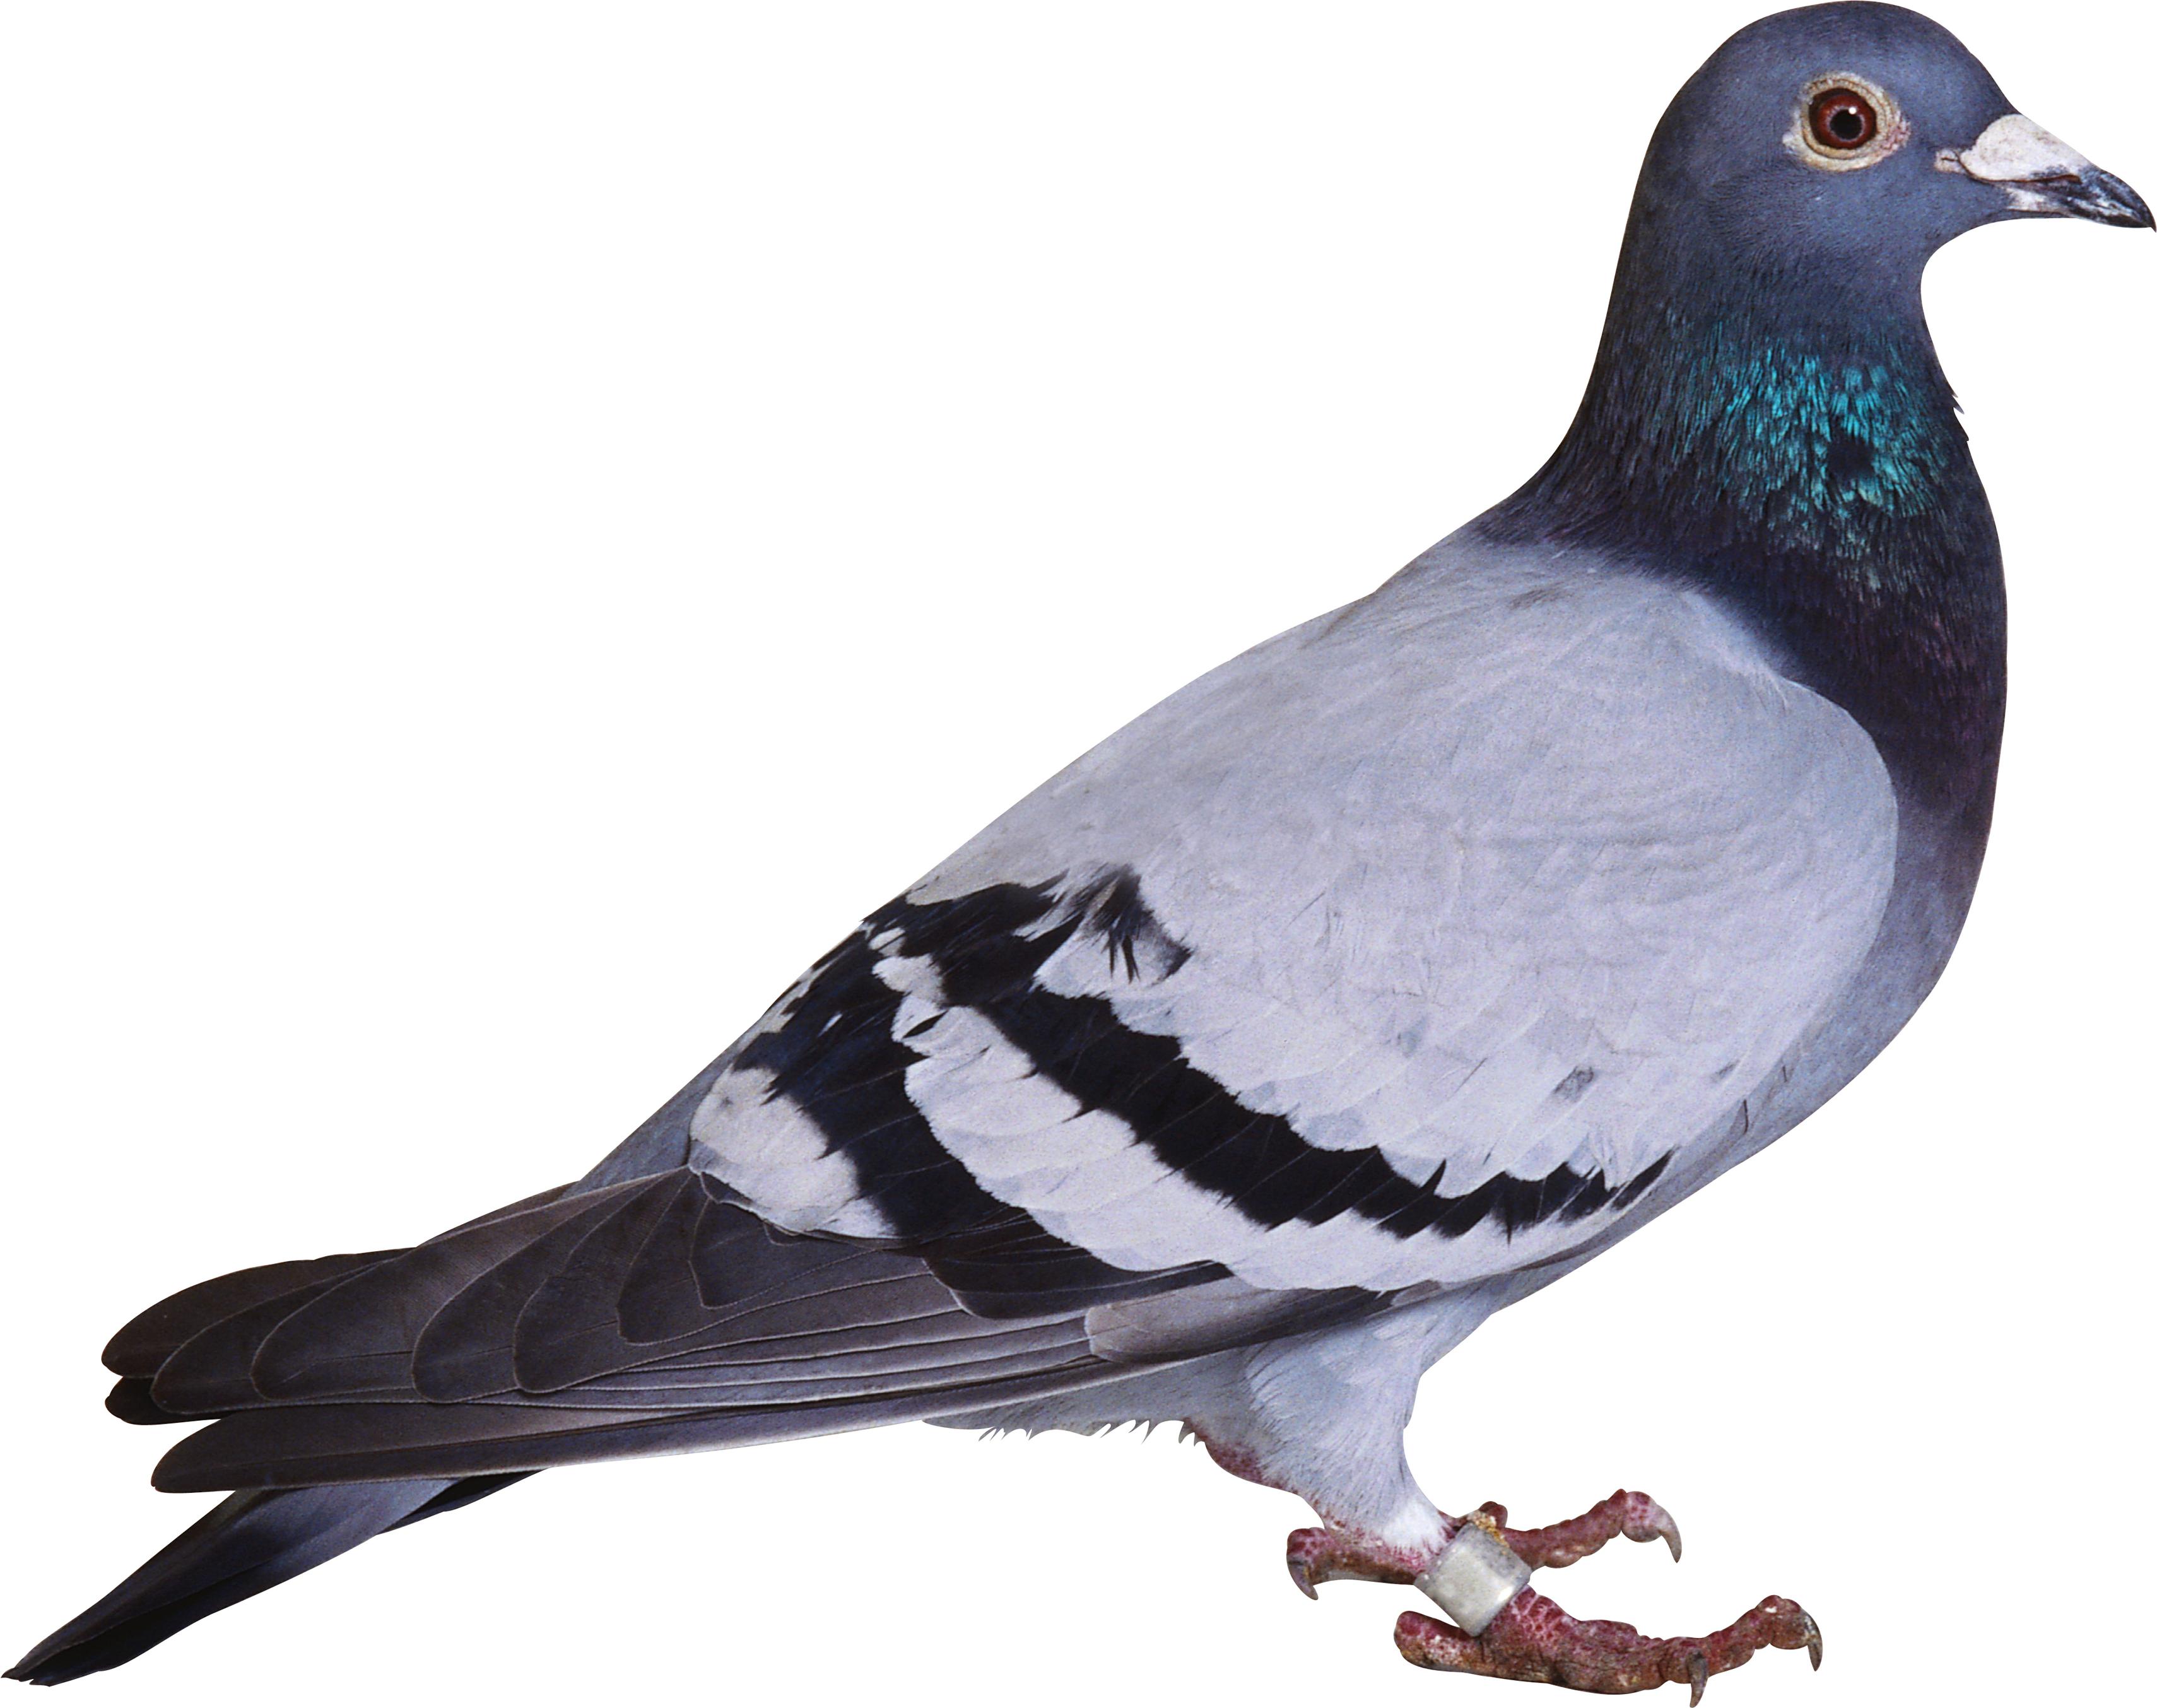 Pigeon clipart simple bird Spot Clipart Clipart Clipart Pigeon